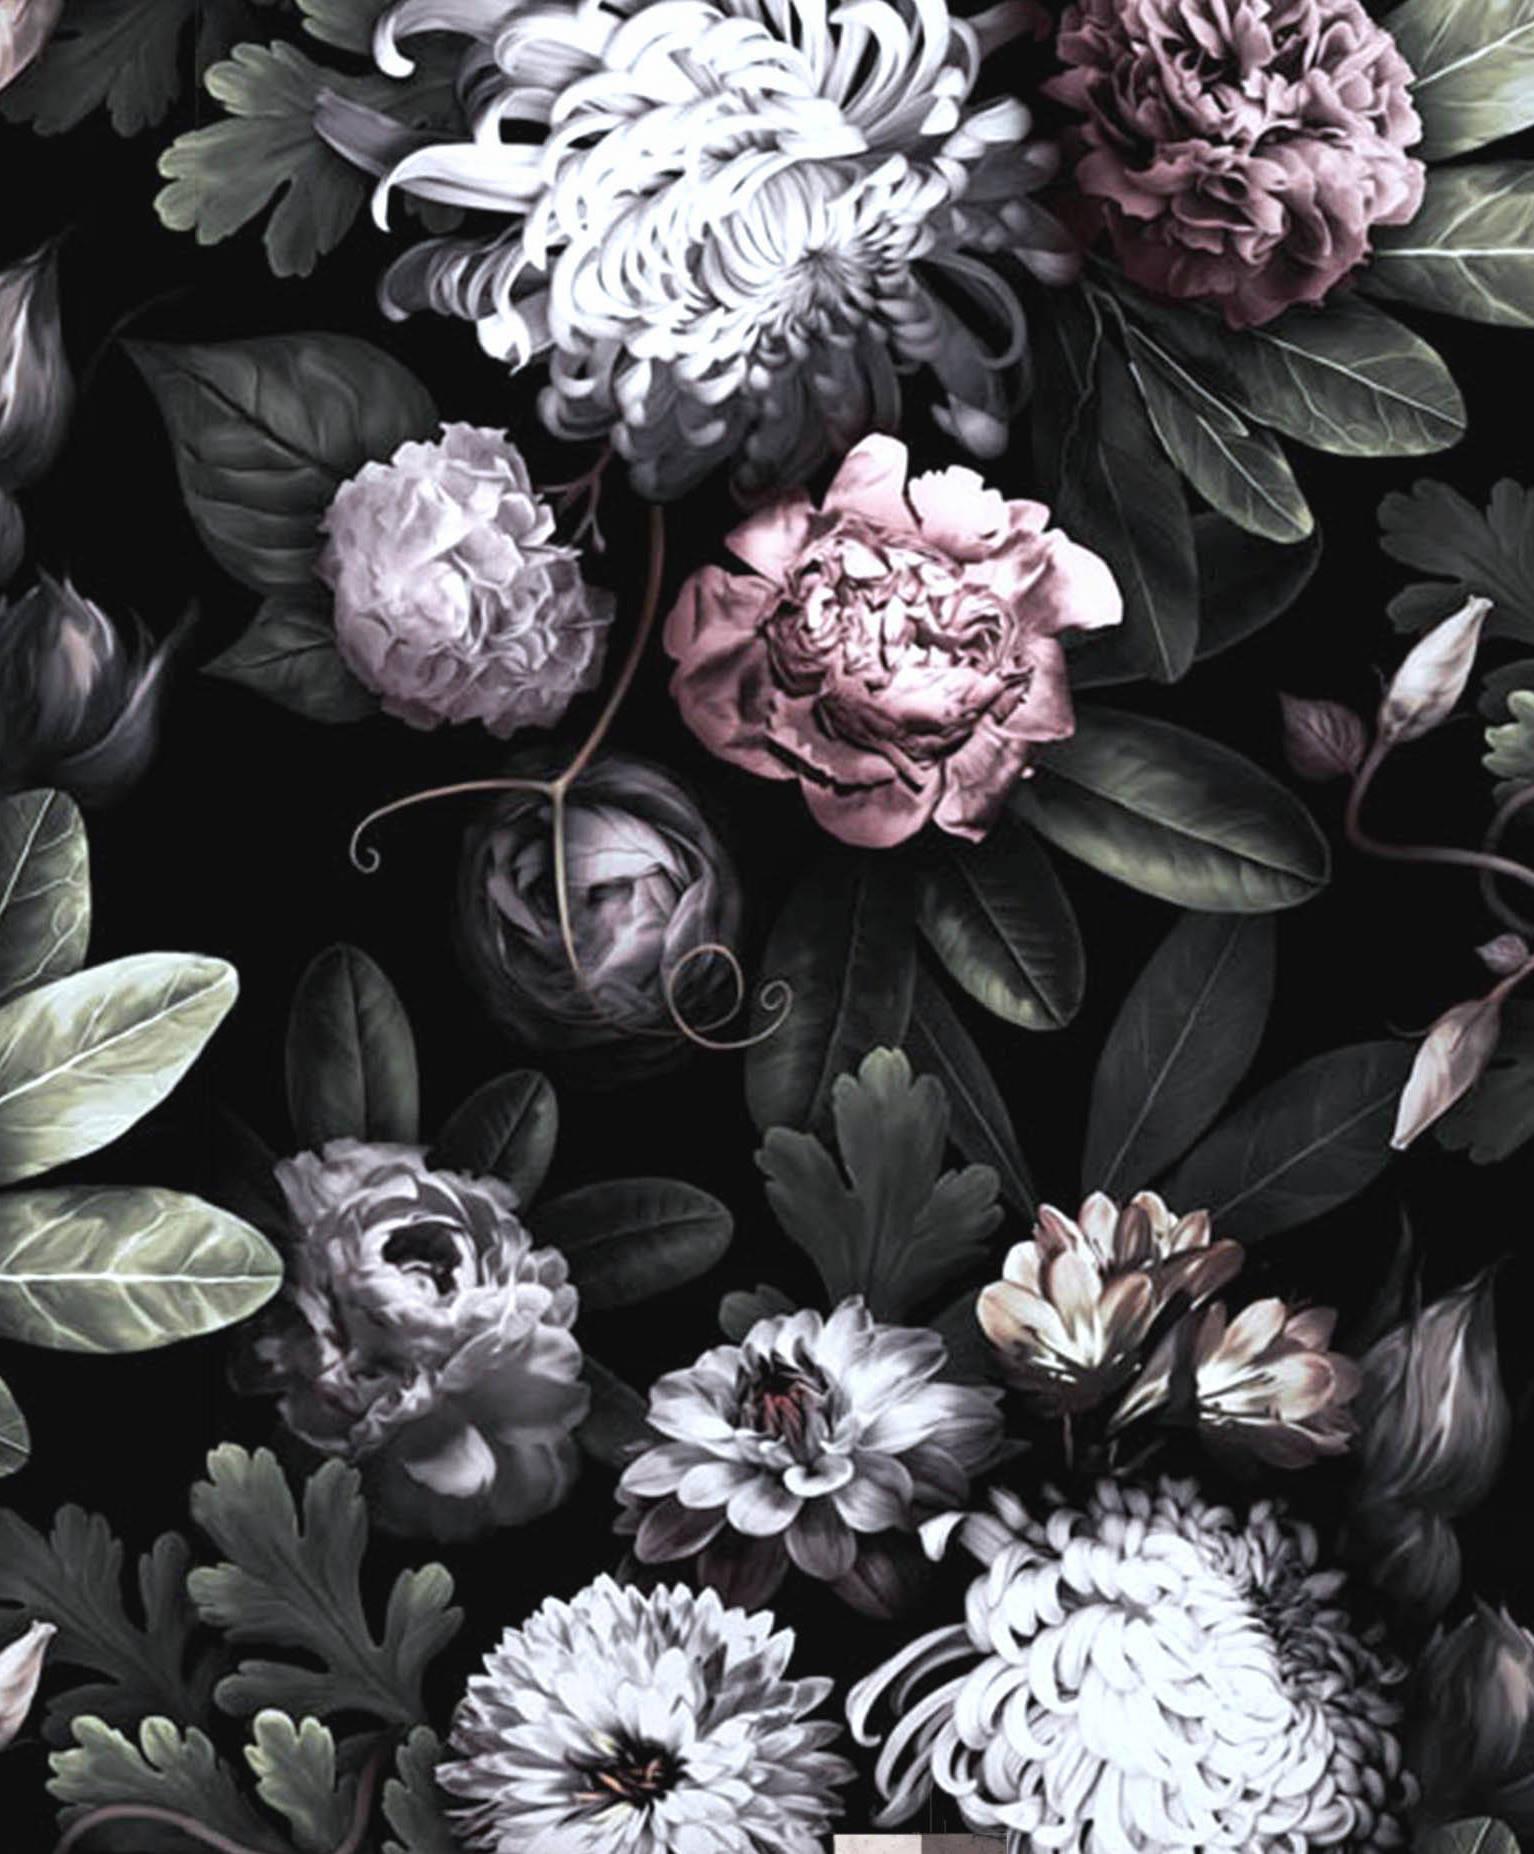 50+ Dark Floral Wallpapers - Download at WallpaperBro ...